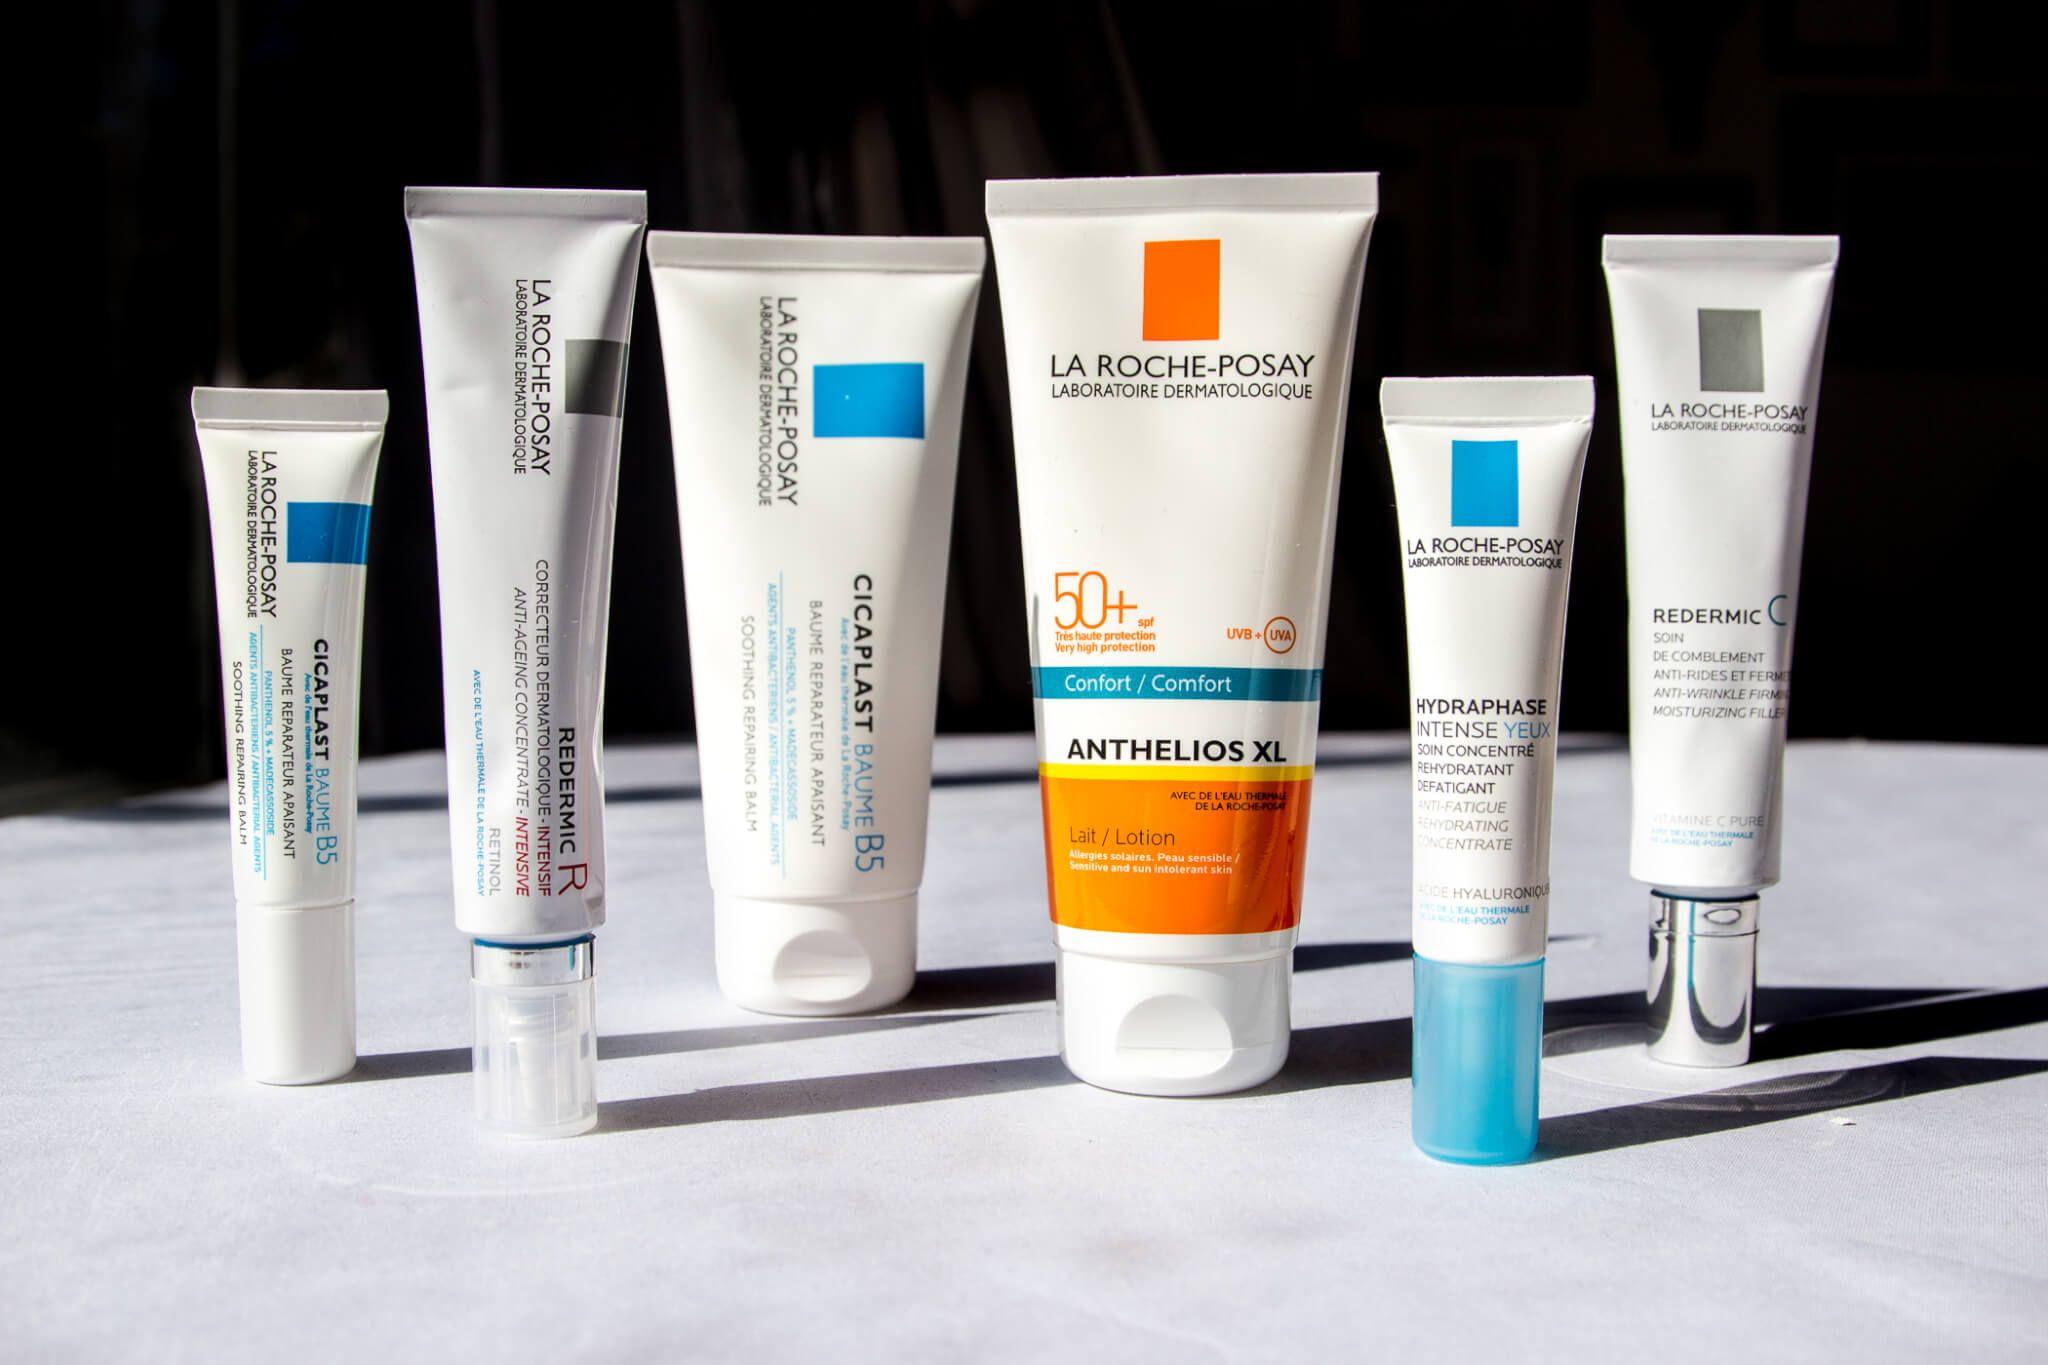 Citypharma Paris The French Skin Care Haul That Saved Me 450 French Skin Care Skin Care Skin Care Brands